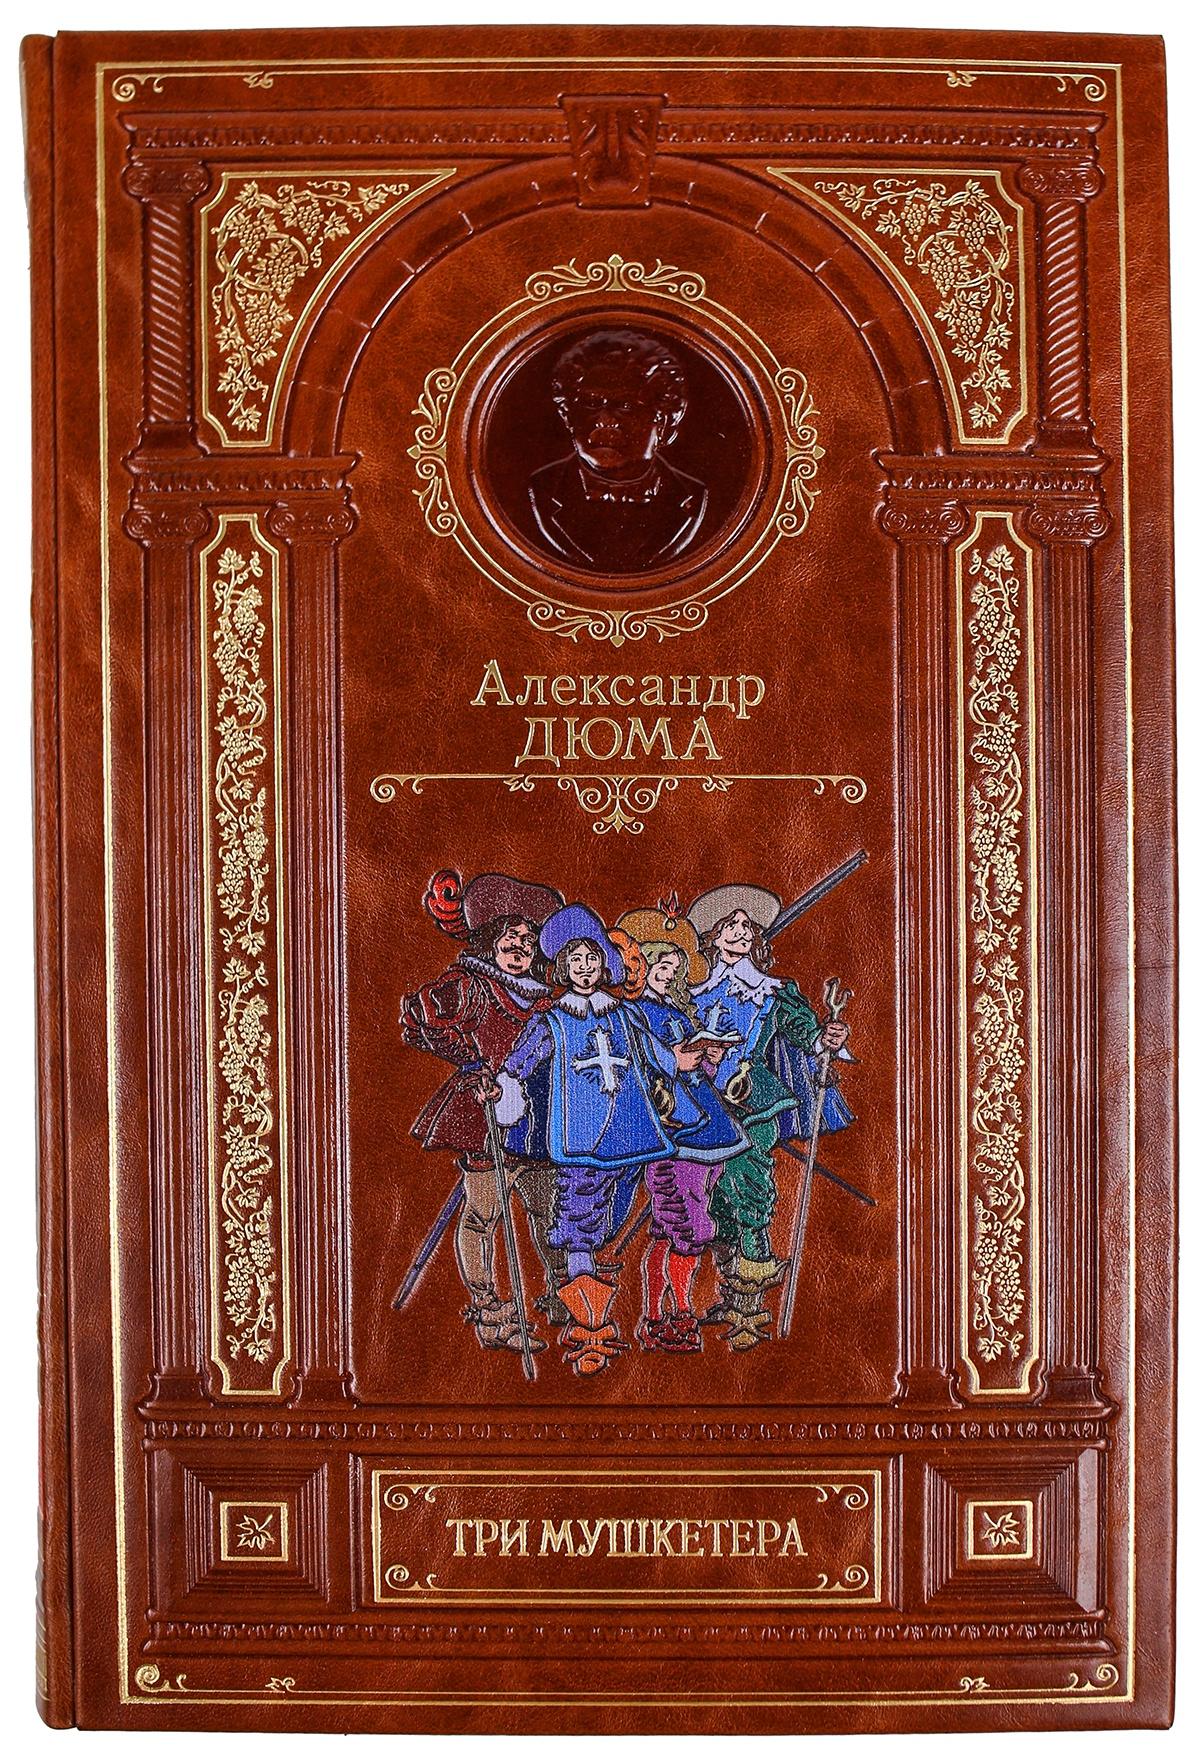 Александр Дюма Три мушкетера (подарочное издание) александр никишин русский мех подарочное издание